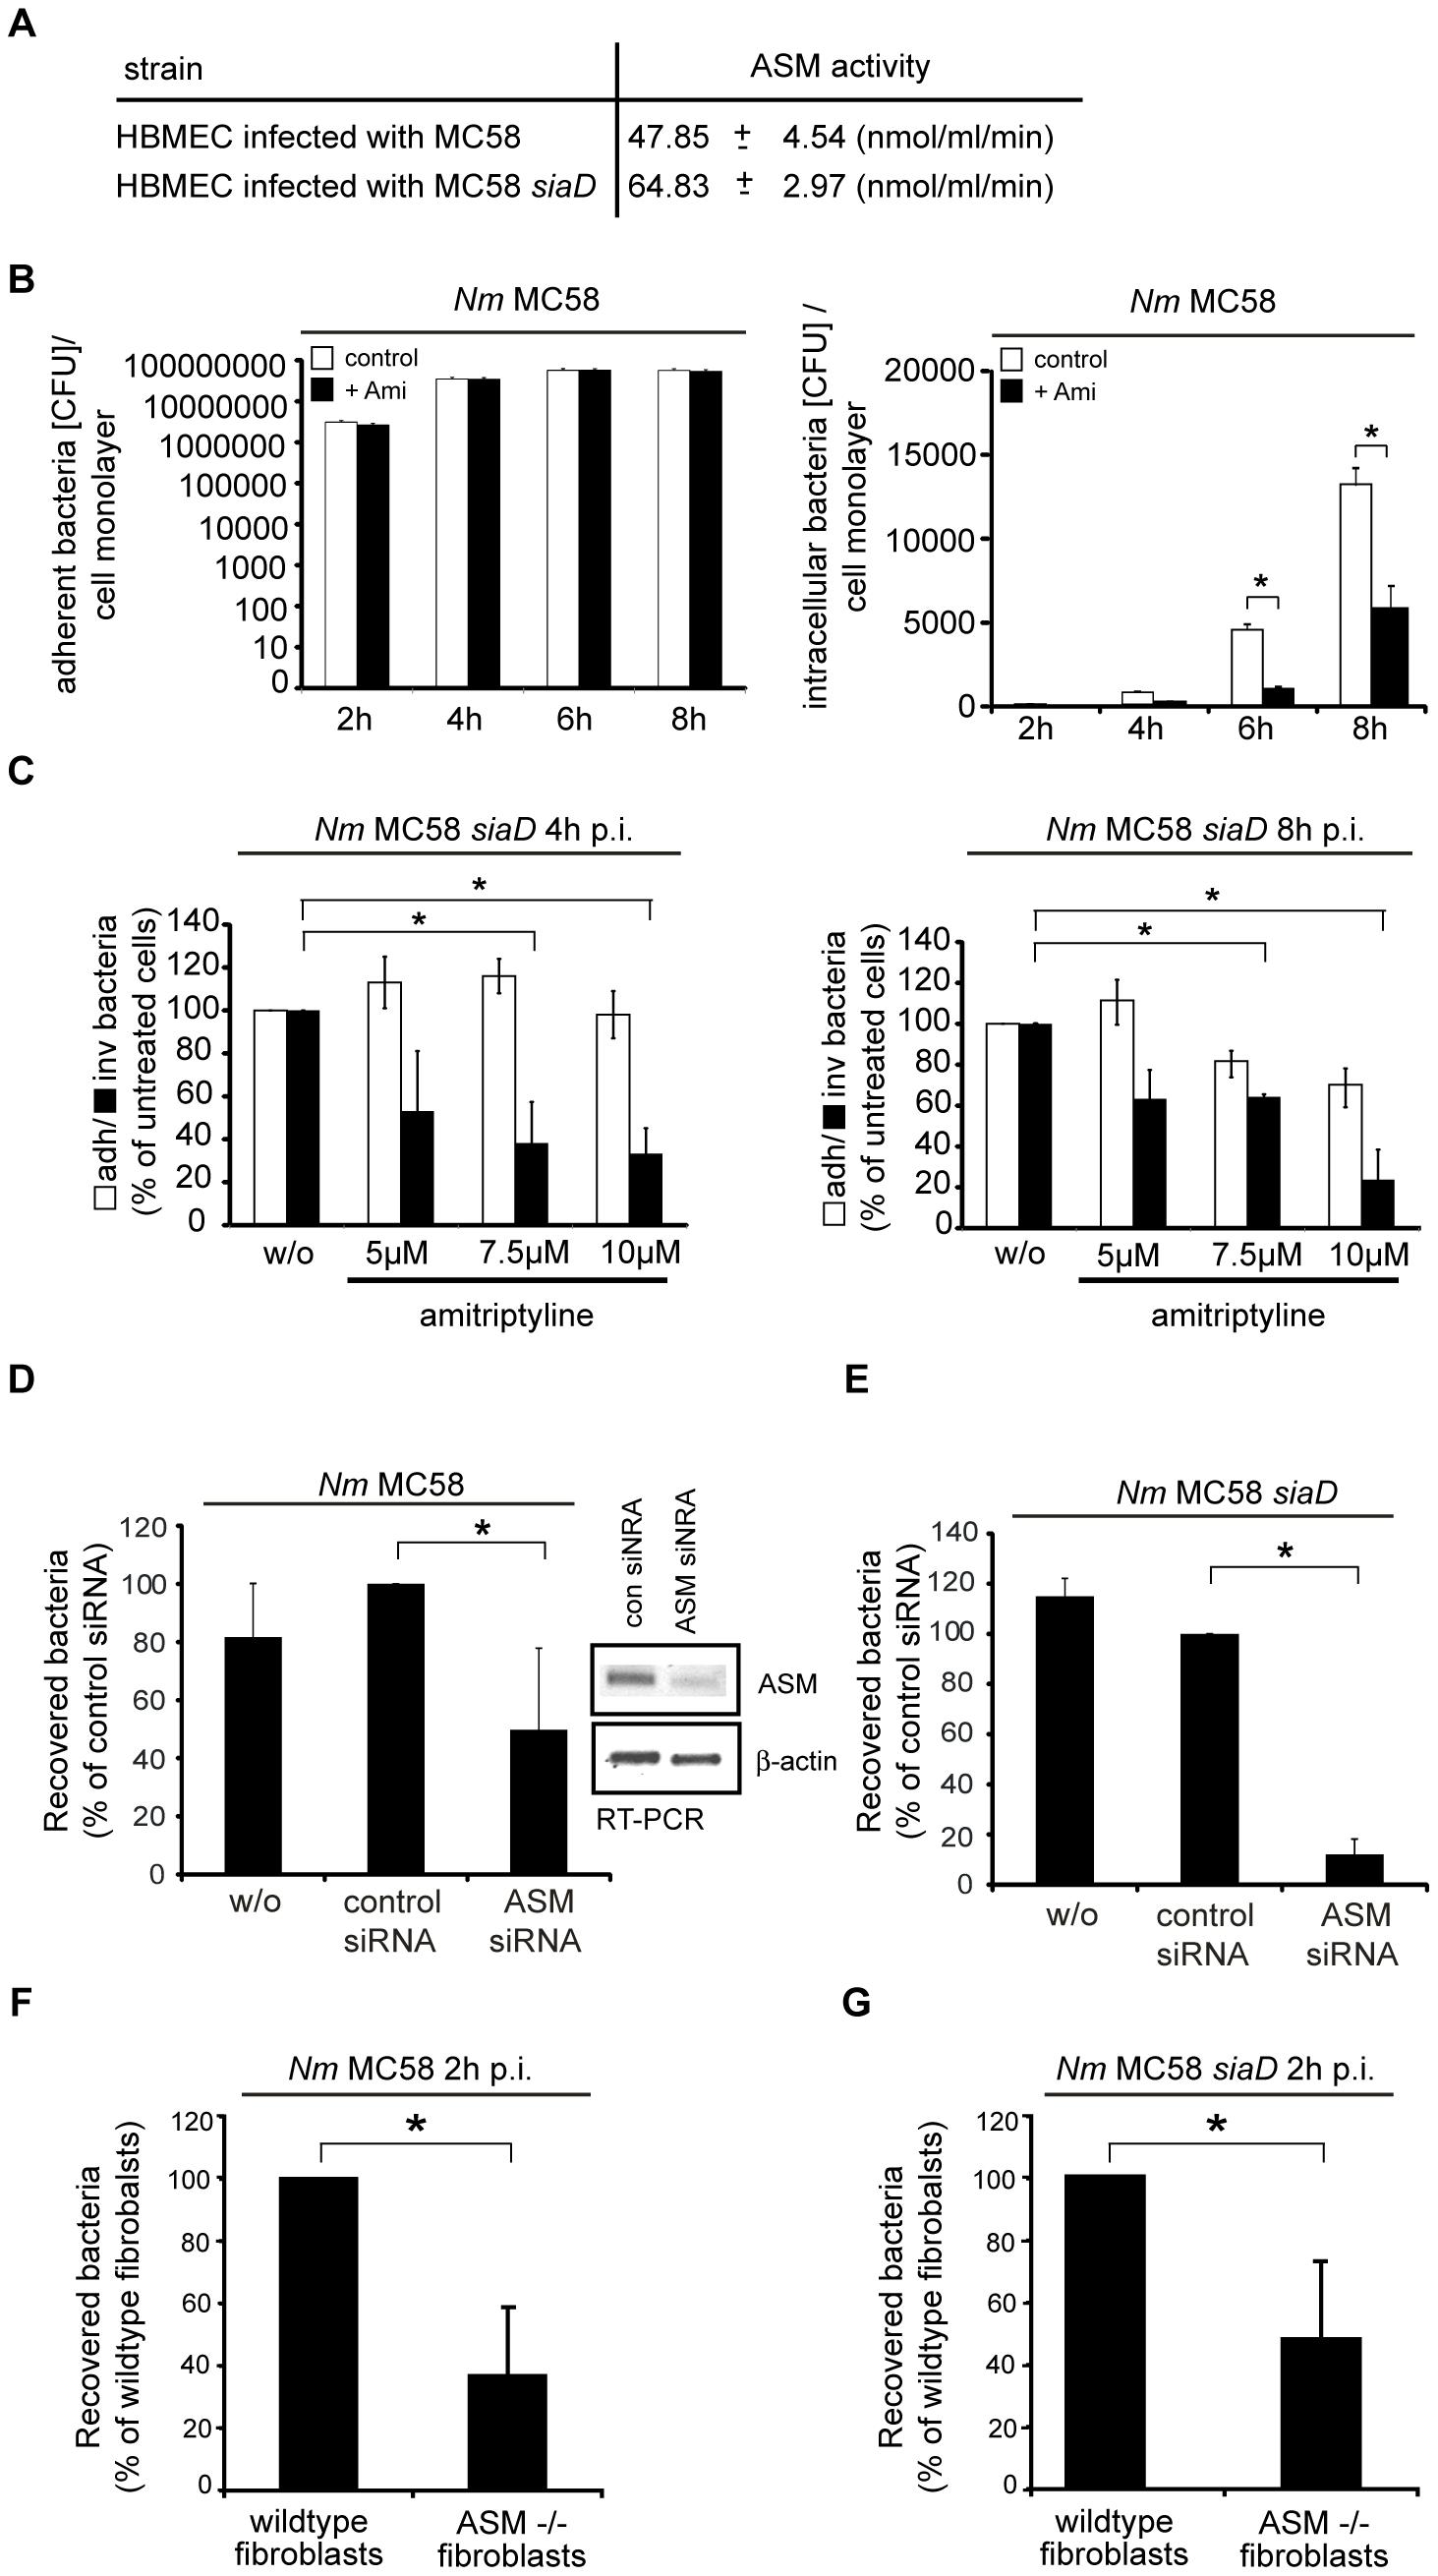 Inhibition of acid sphingomyelinase prevents <i>N. meningitidis</i> uptake by host cells.